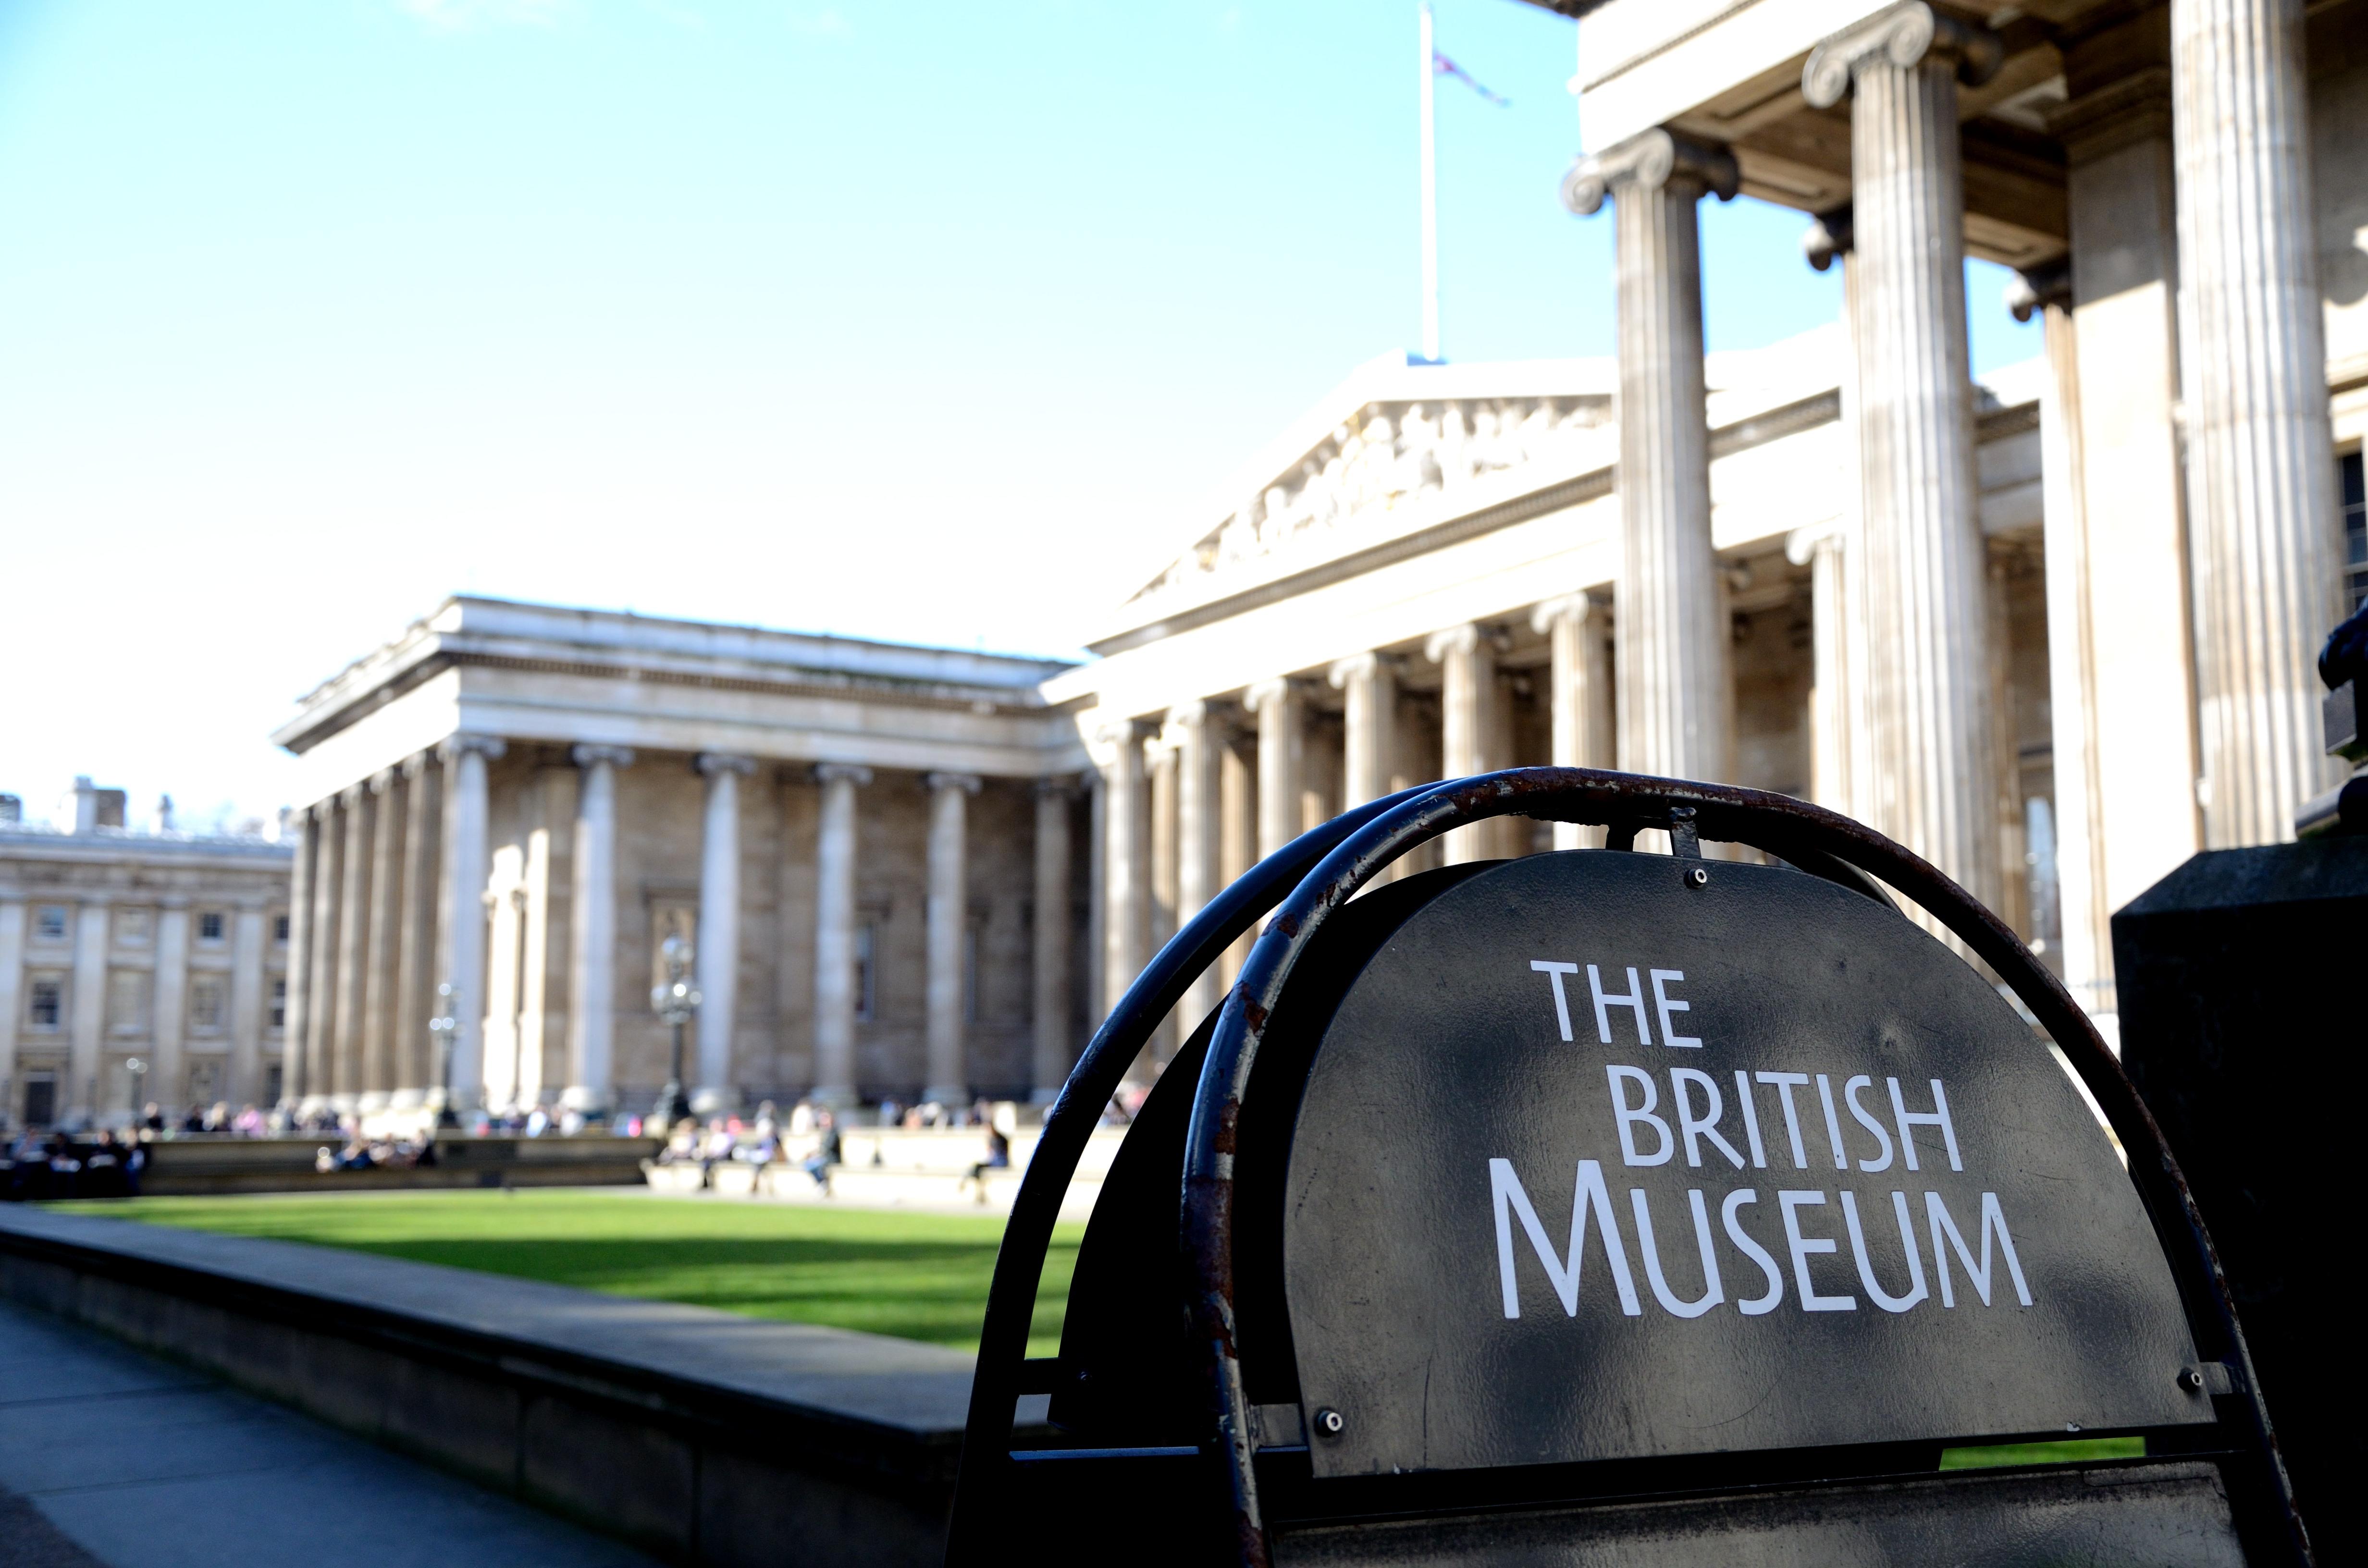 #05 Tutorial – Case Study: British Museum B on Vimeo